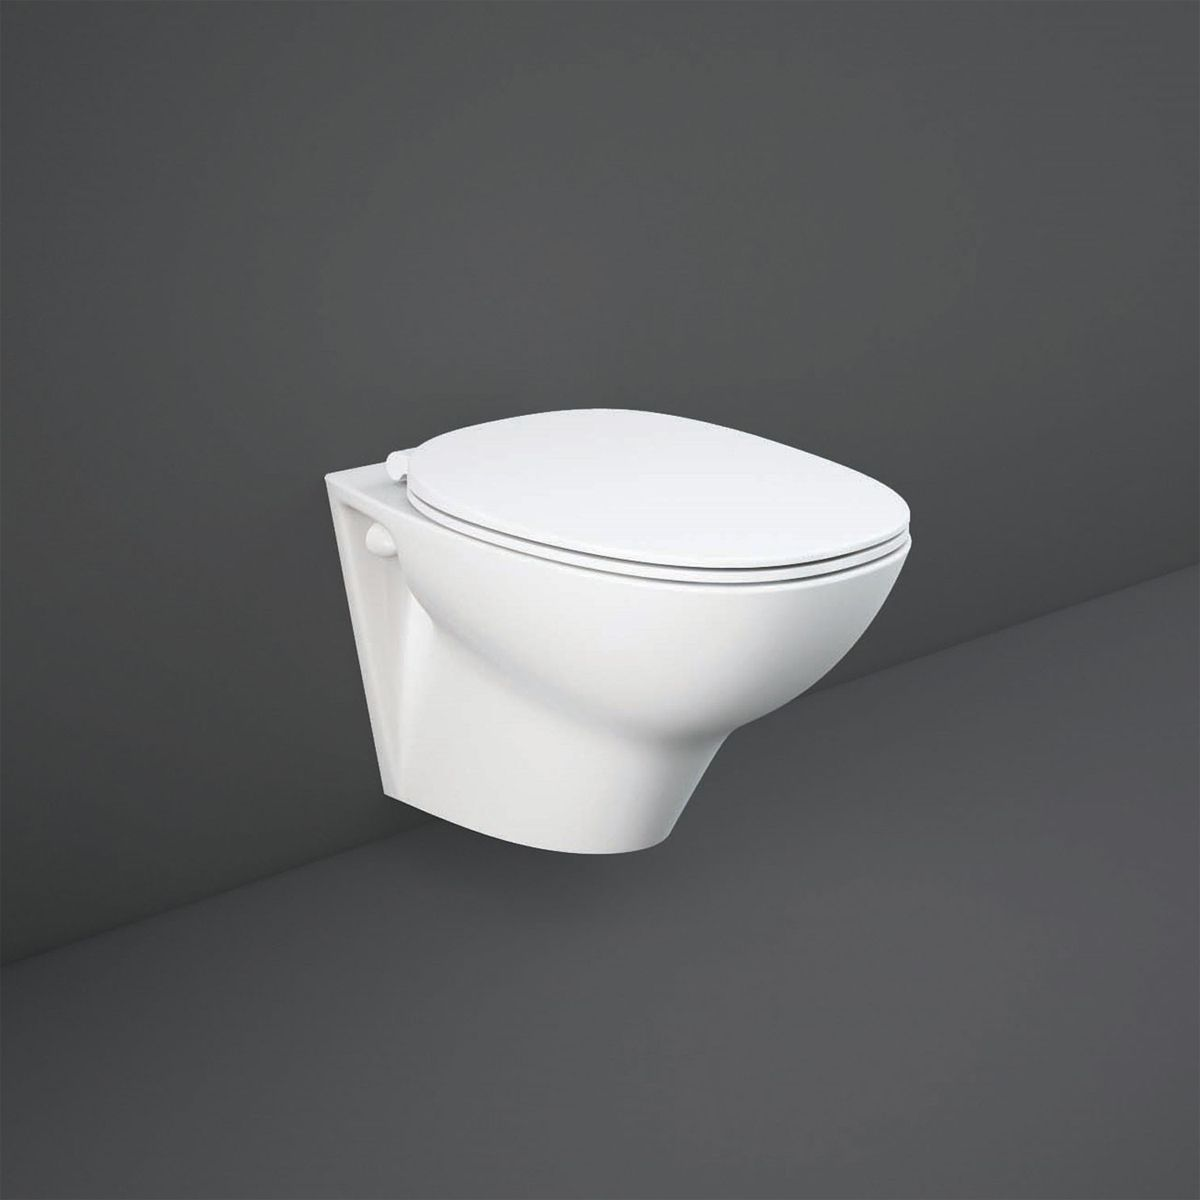 RAK Morning Rimless Wall Hung Toilet with Soft Close Seat